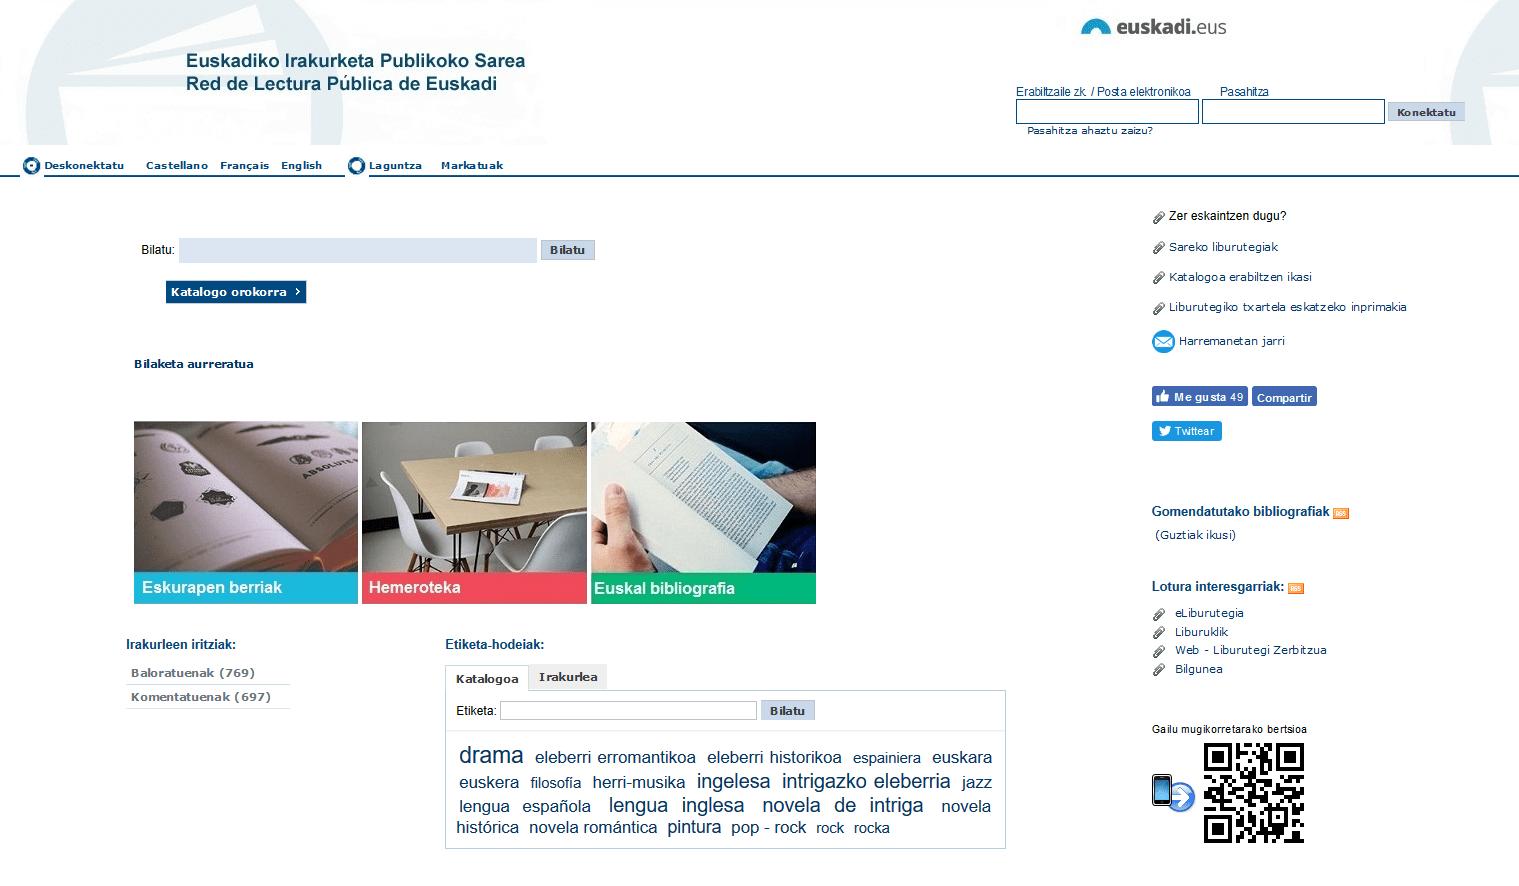 Catálogo de la Red de Lectura Pública de Euskadi